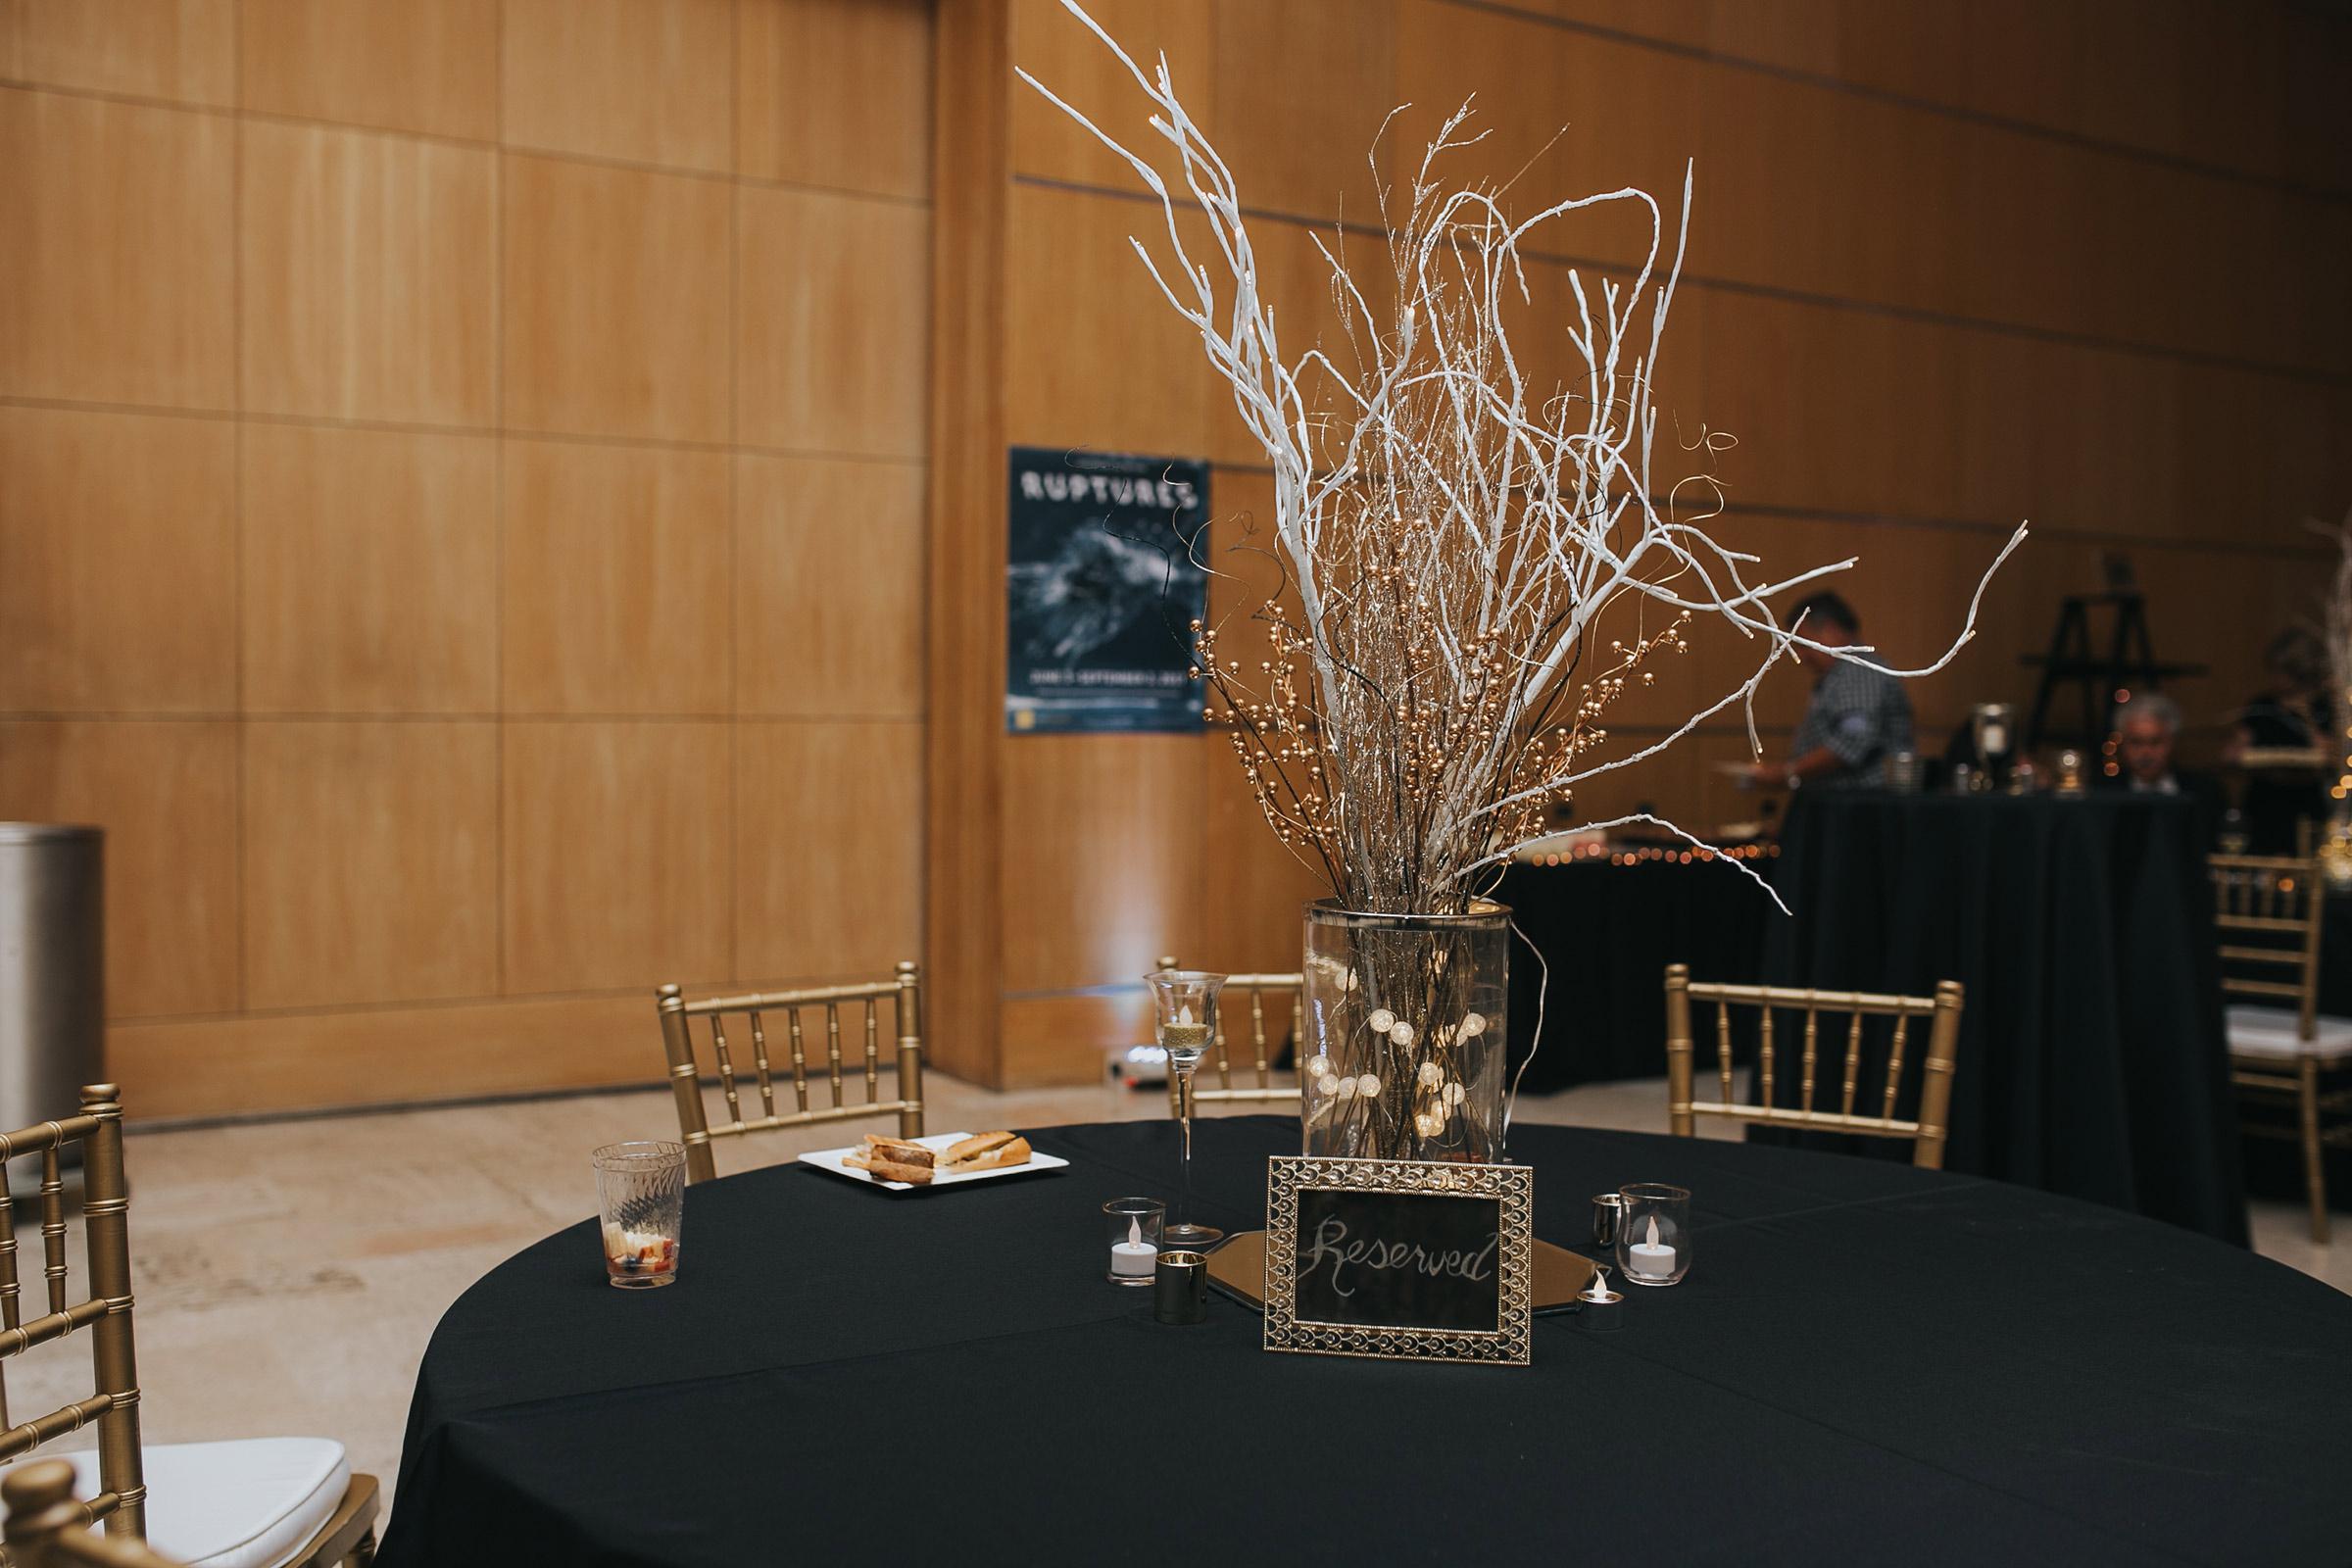 reserved-table-decor-desmoines-iowa-art-center-raelyn-ramey-photography.jpg